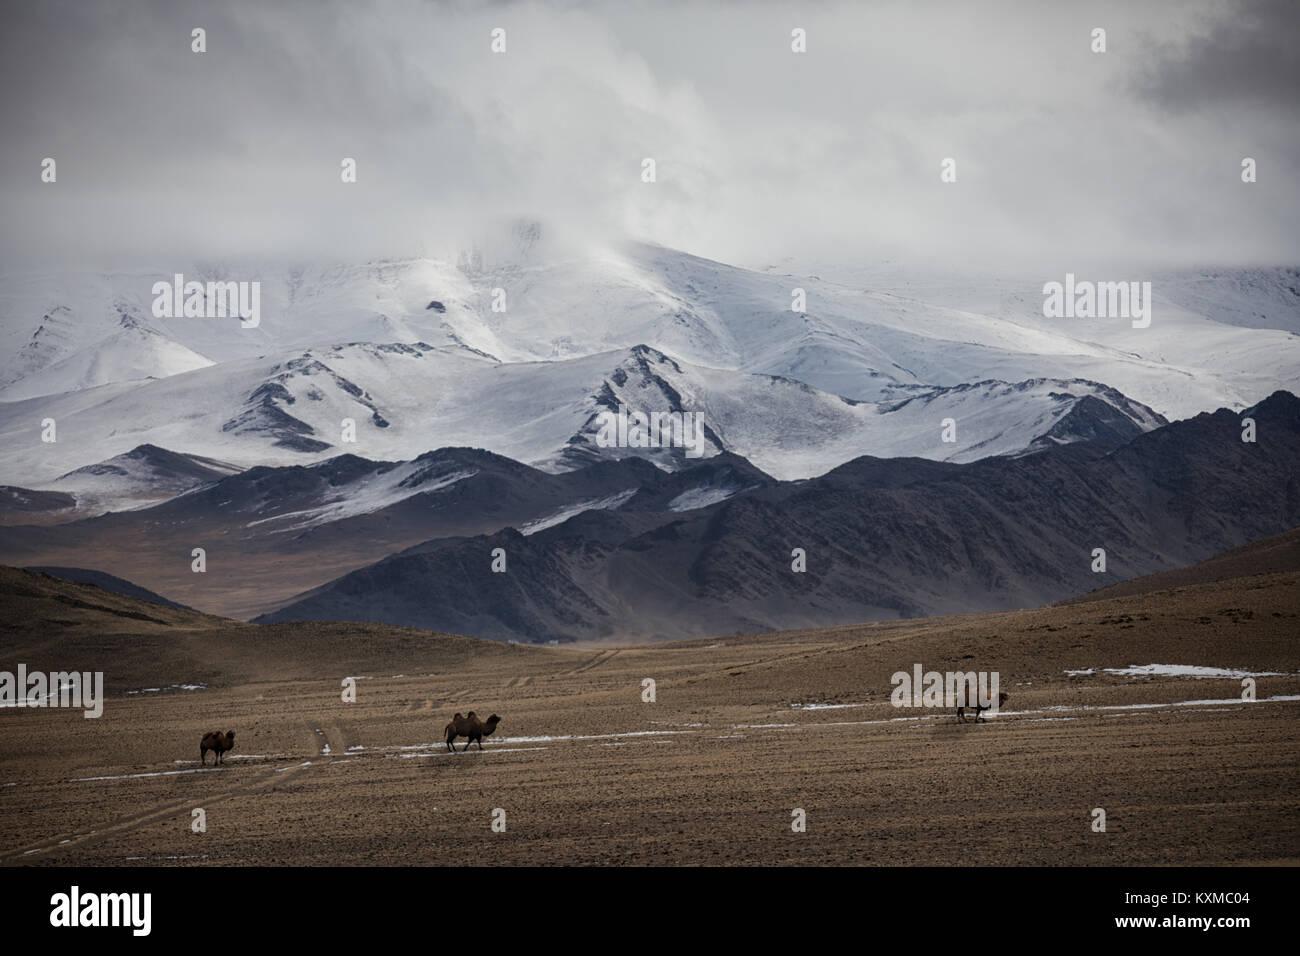 Mongolia lago invierno nevadas montañas nubladas praderas camellos estepas mongolas Imagen De Stock